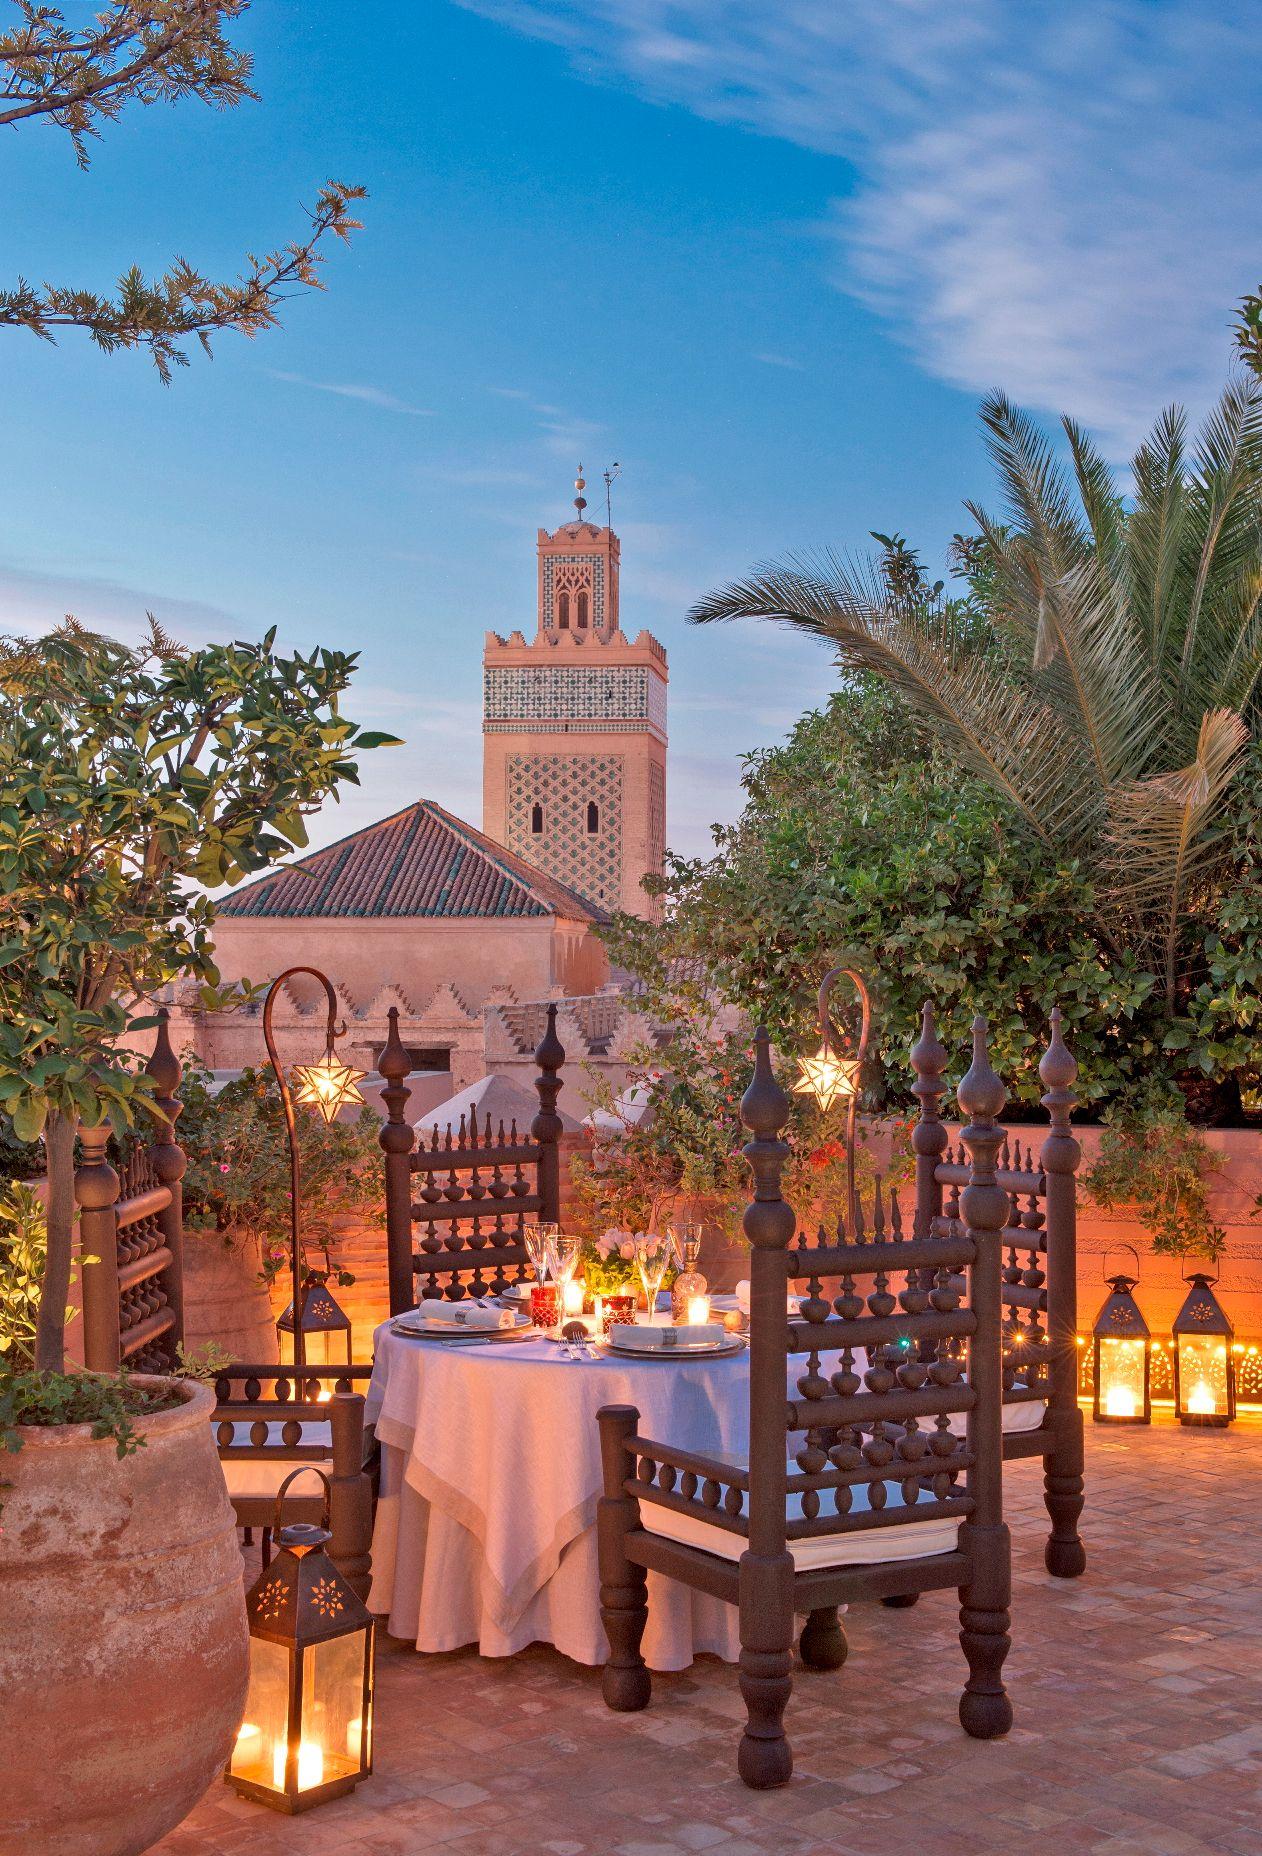 La Sultana Marrakech Morocco Luxury Hotel Review By